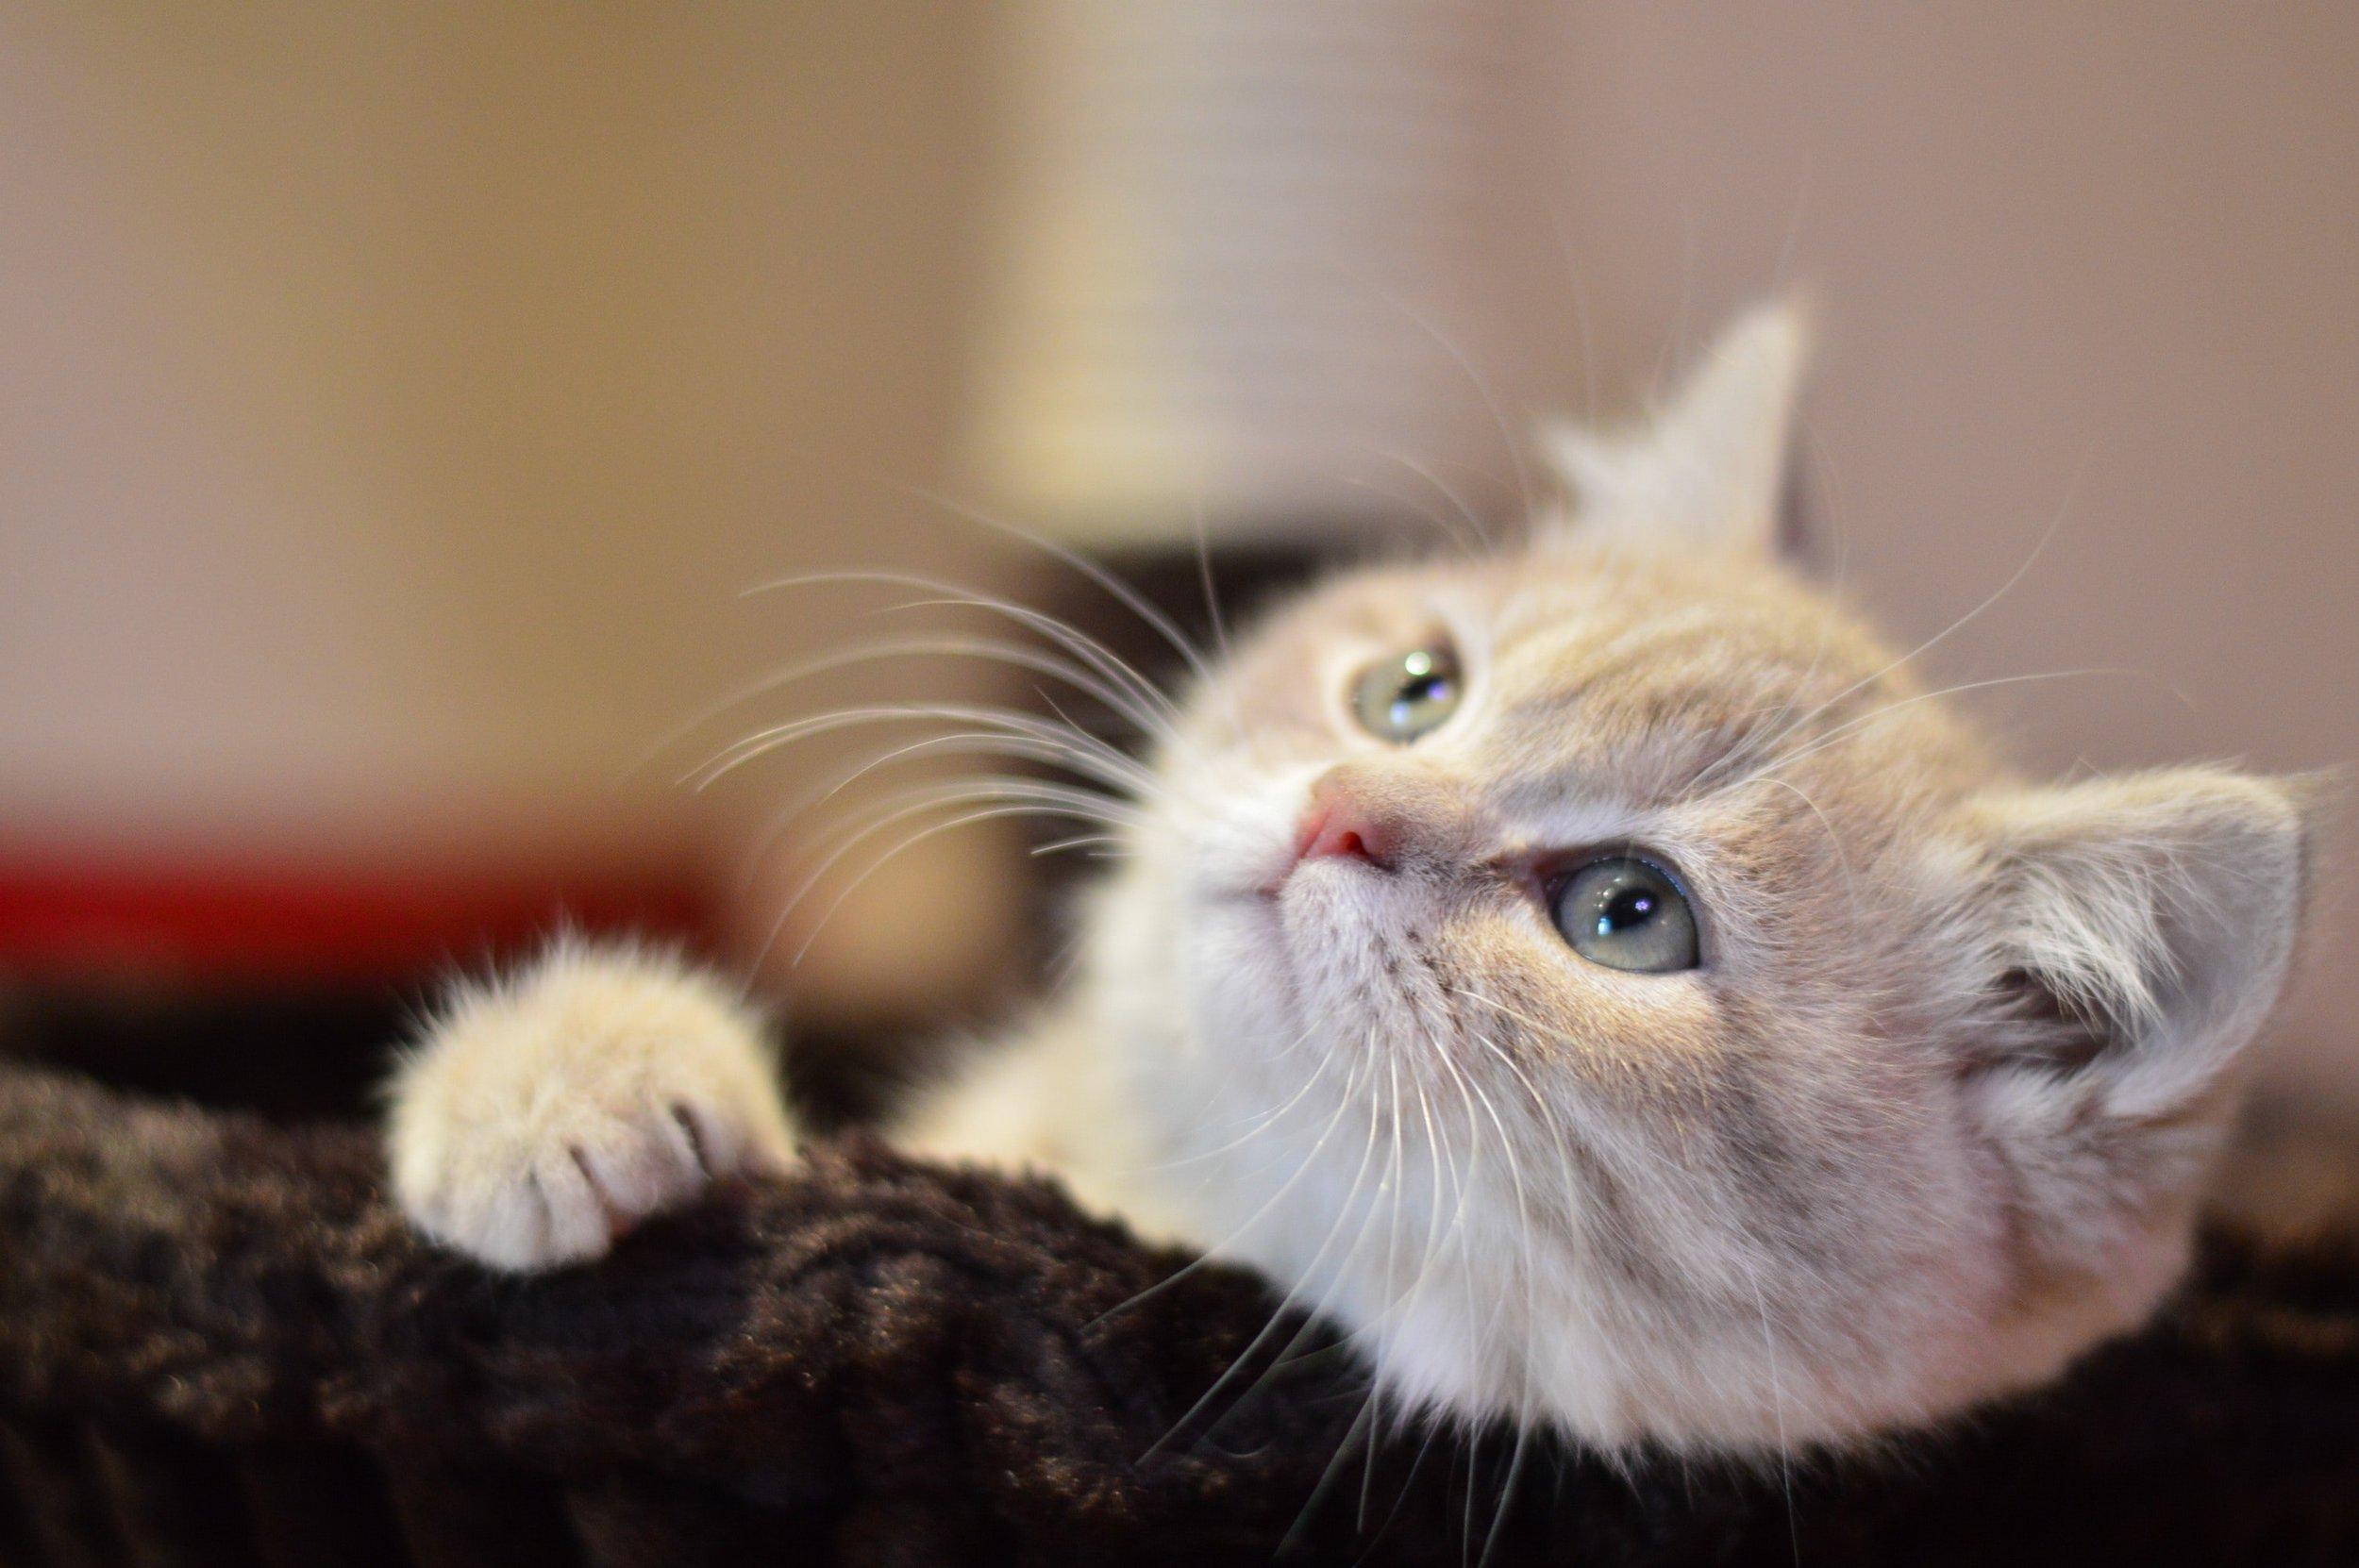 adorable-animal-cat-236660.jpg